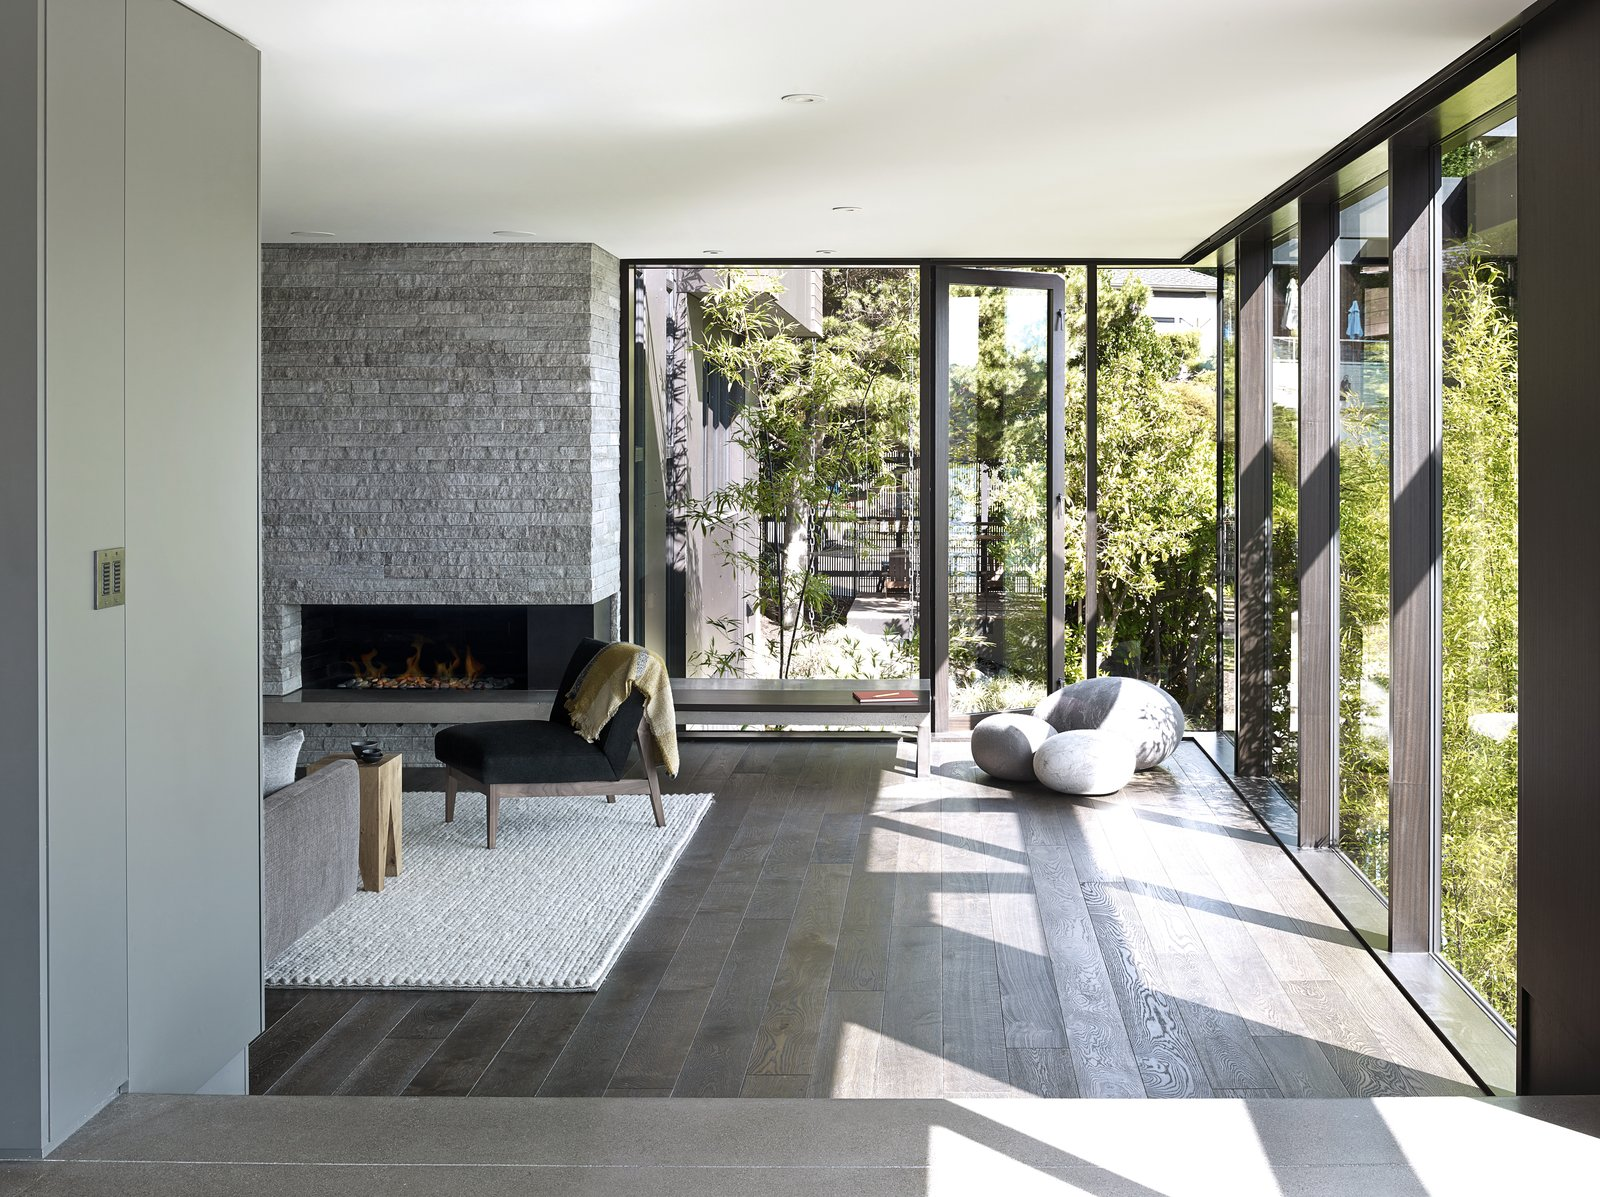 Laurelhurst Residence Tagged: Living Room, Medium Hardwood Floor, and Standard Layout Fireplace. Laurelhurst Residence by mw|works